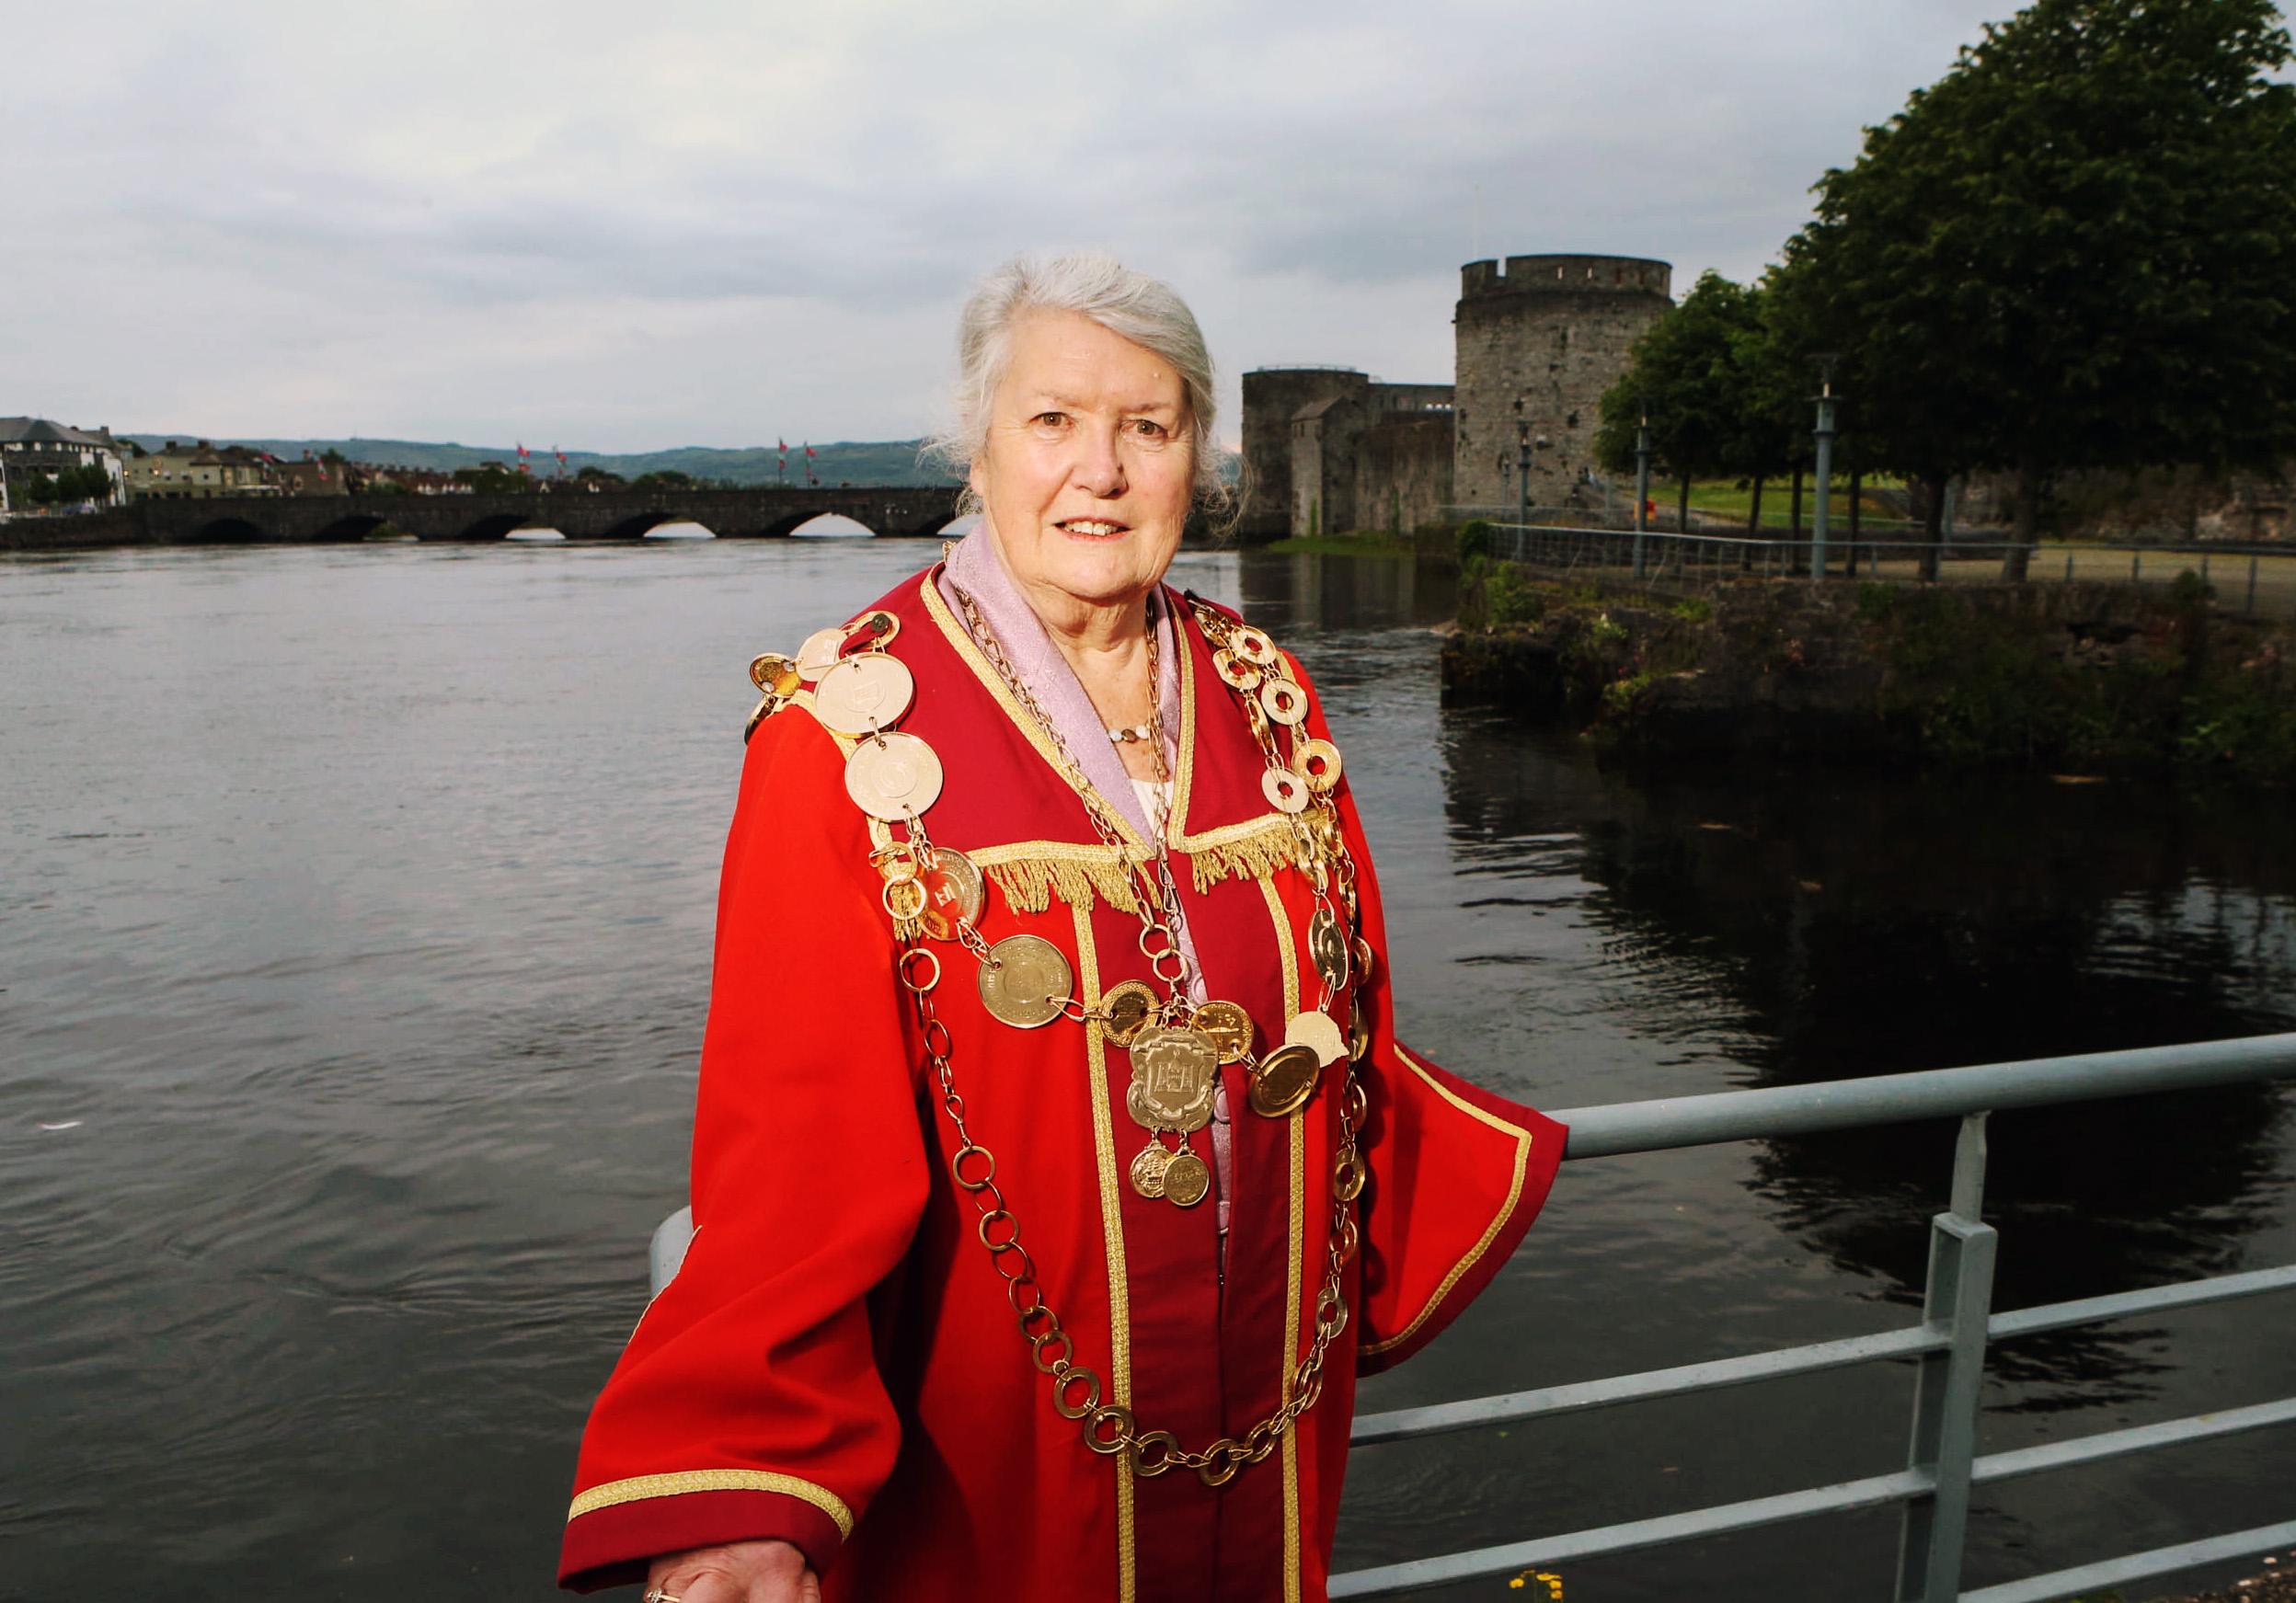 24-6-13 Cllr Kathleen Leddin 817th Mayor of Limerick